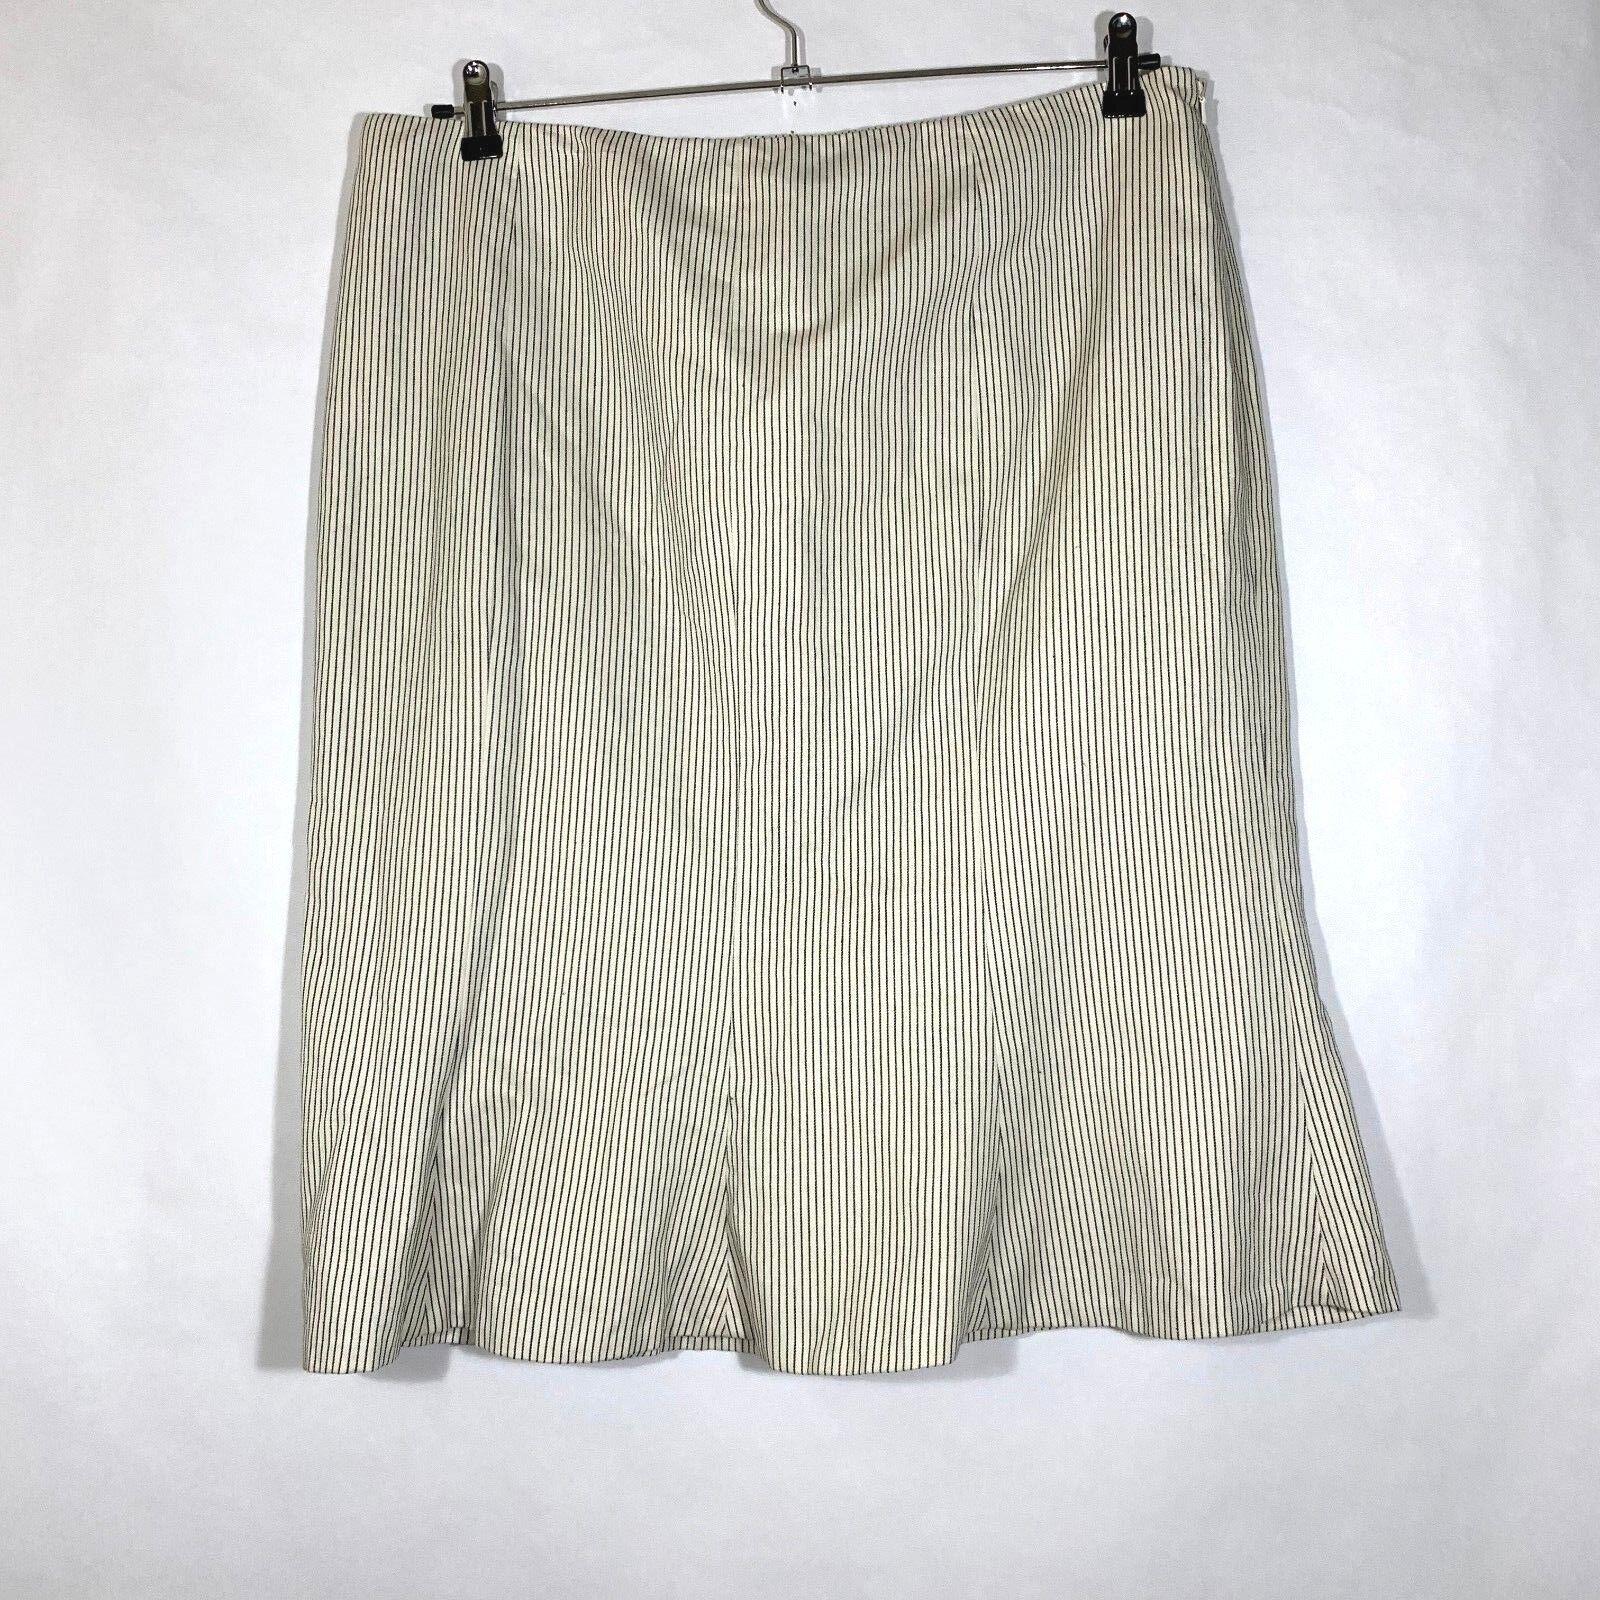 NEW LRL Ralph Lauren Stripe Fit Flare Gored  149 Skirt Women Riveria Lined Sz 16